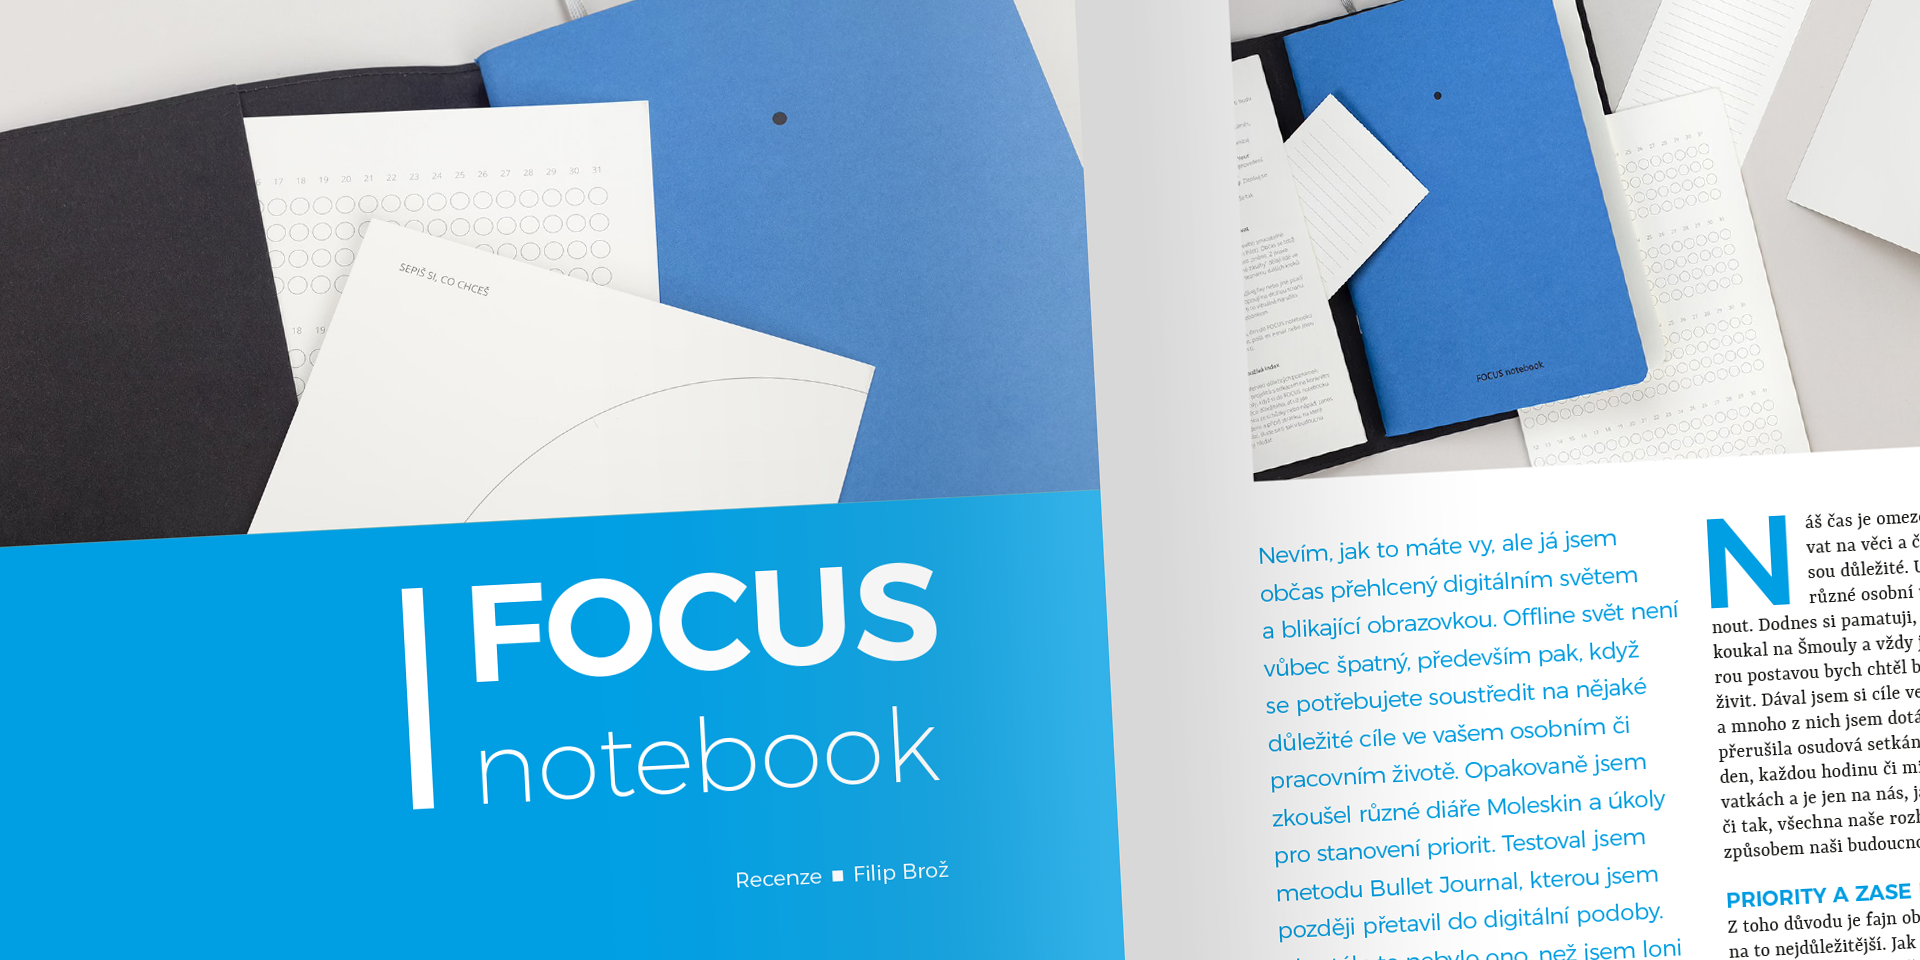 Focus notebook